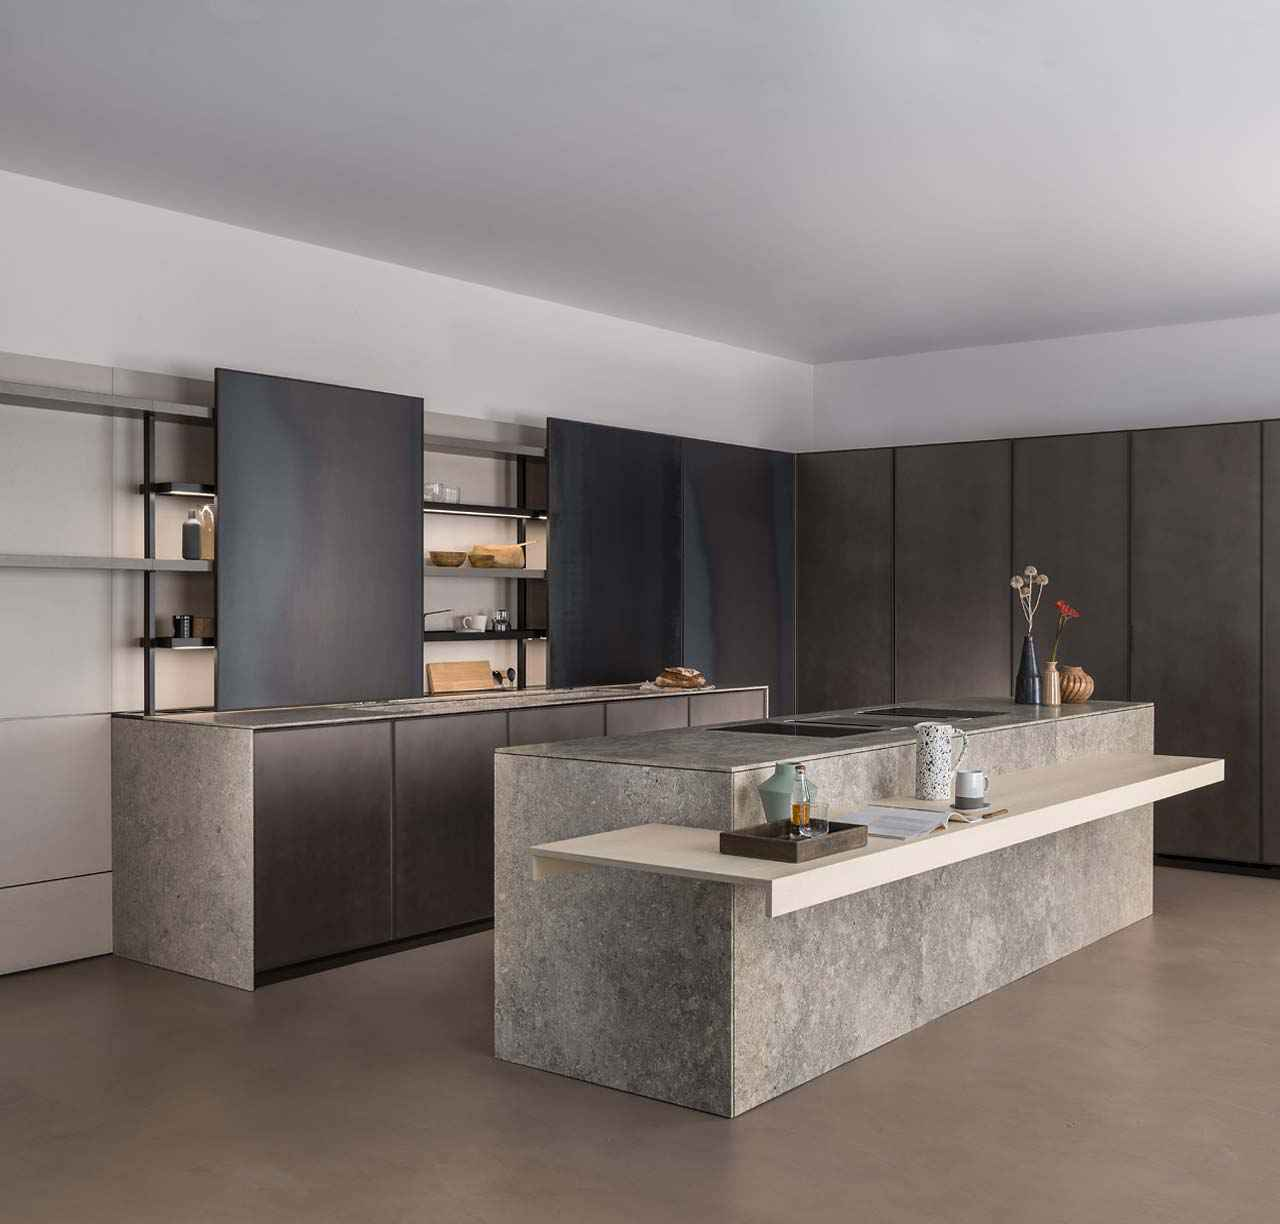 Bespoke custom-designed kitchen with marble worktop